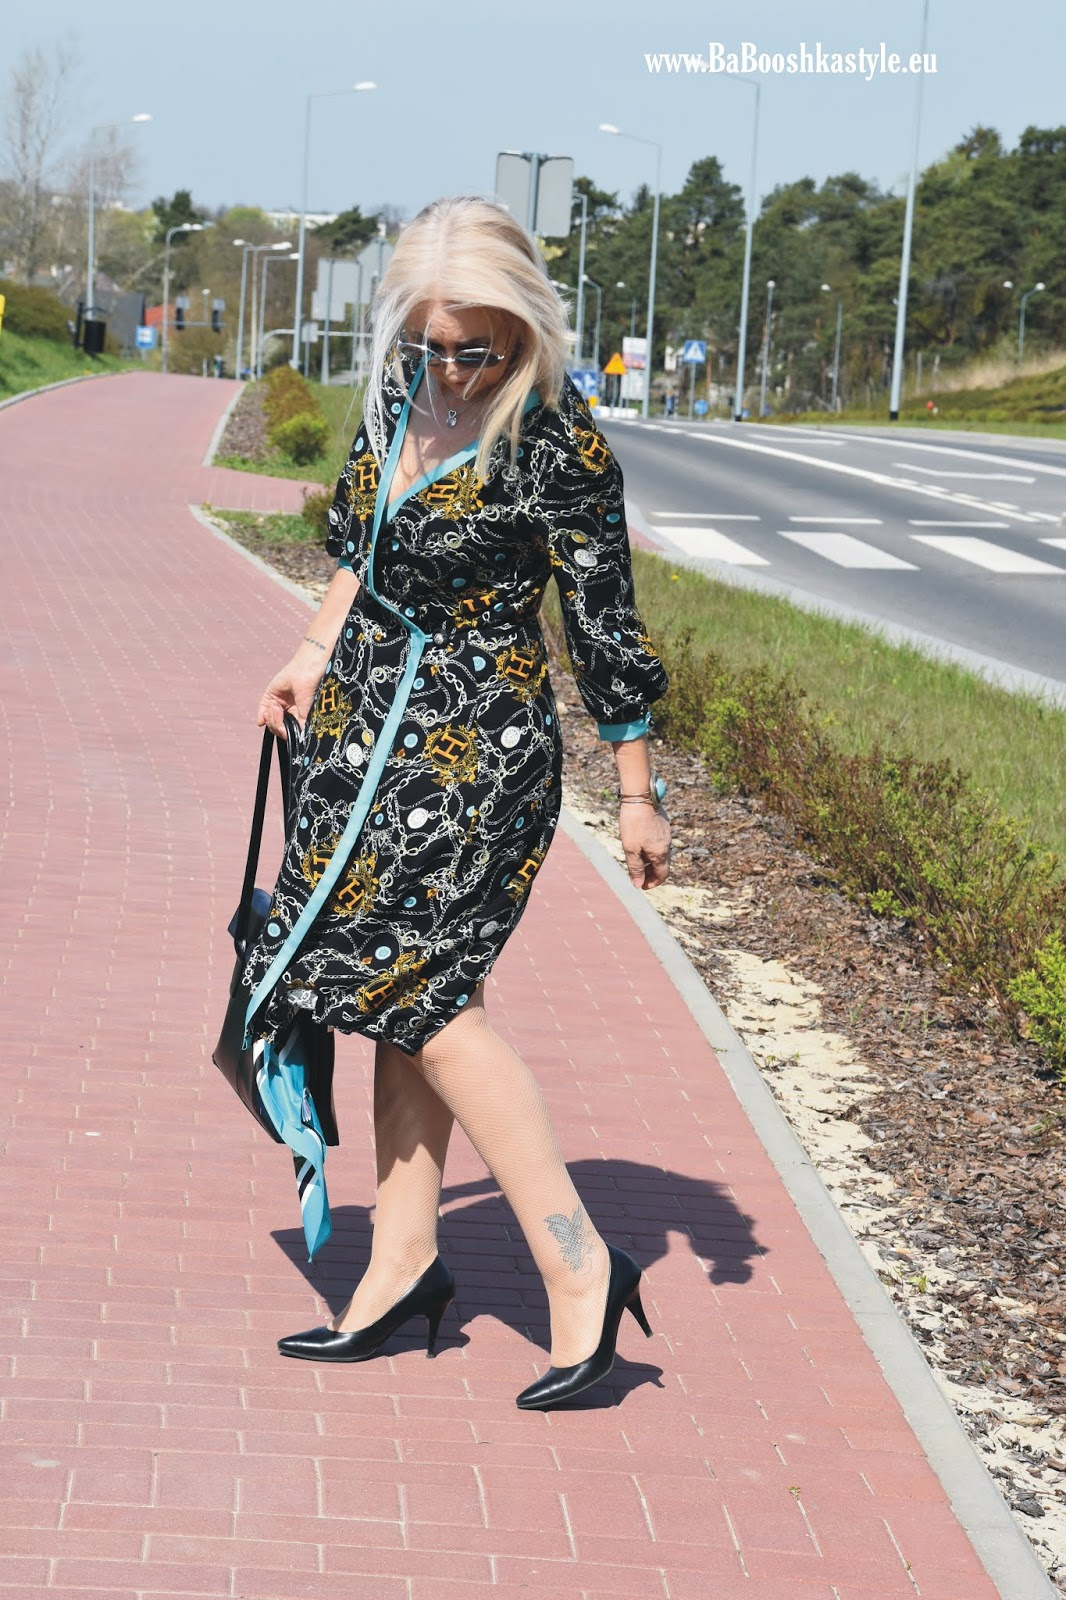 Babooshkastyle, autorska sukienka, Orsay, Ryłko, Skórzana.pl, over50style, over50fashion